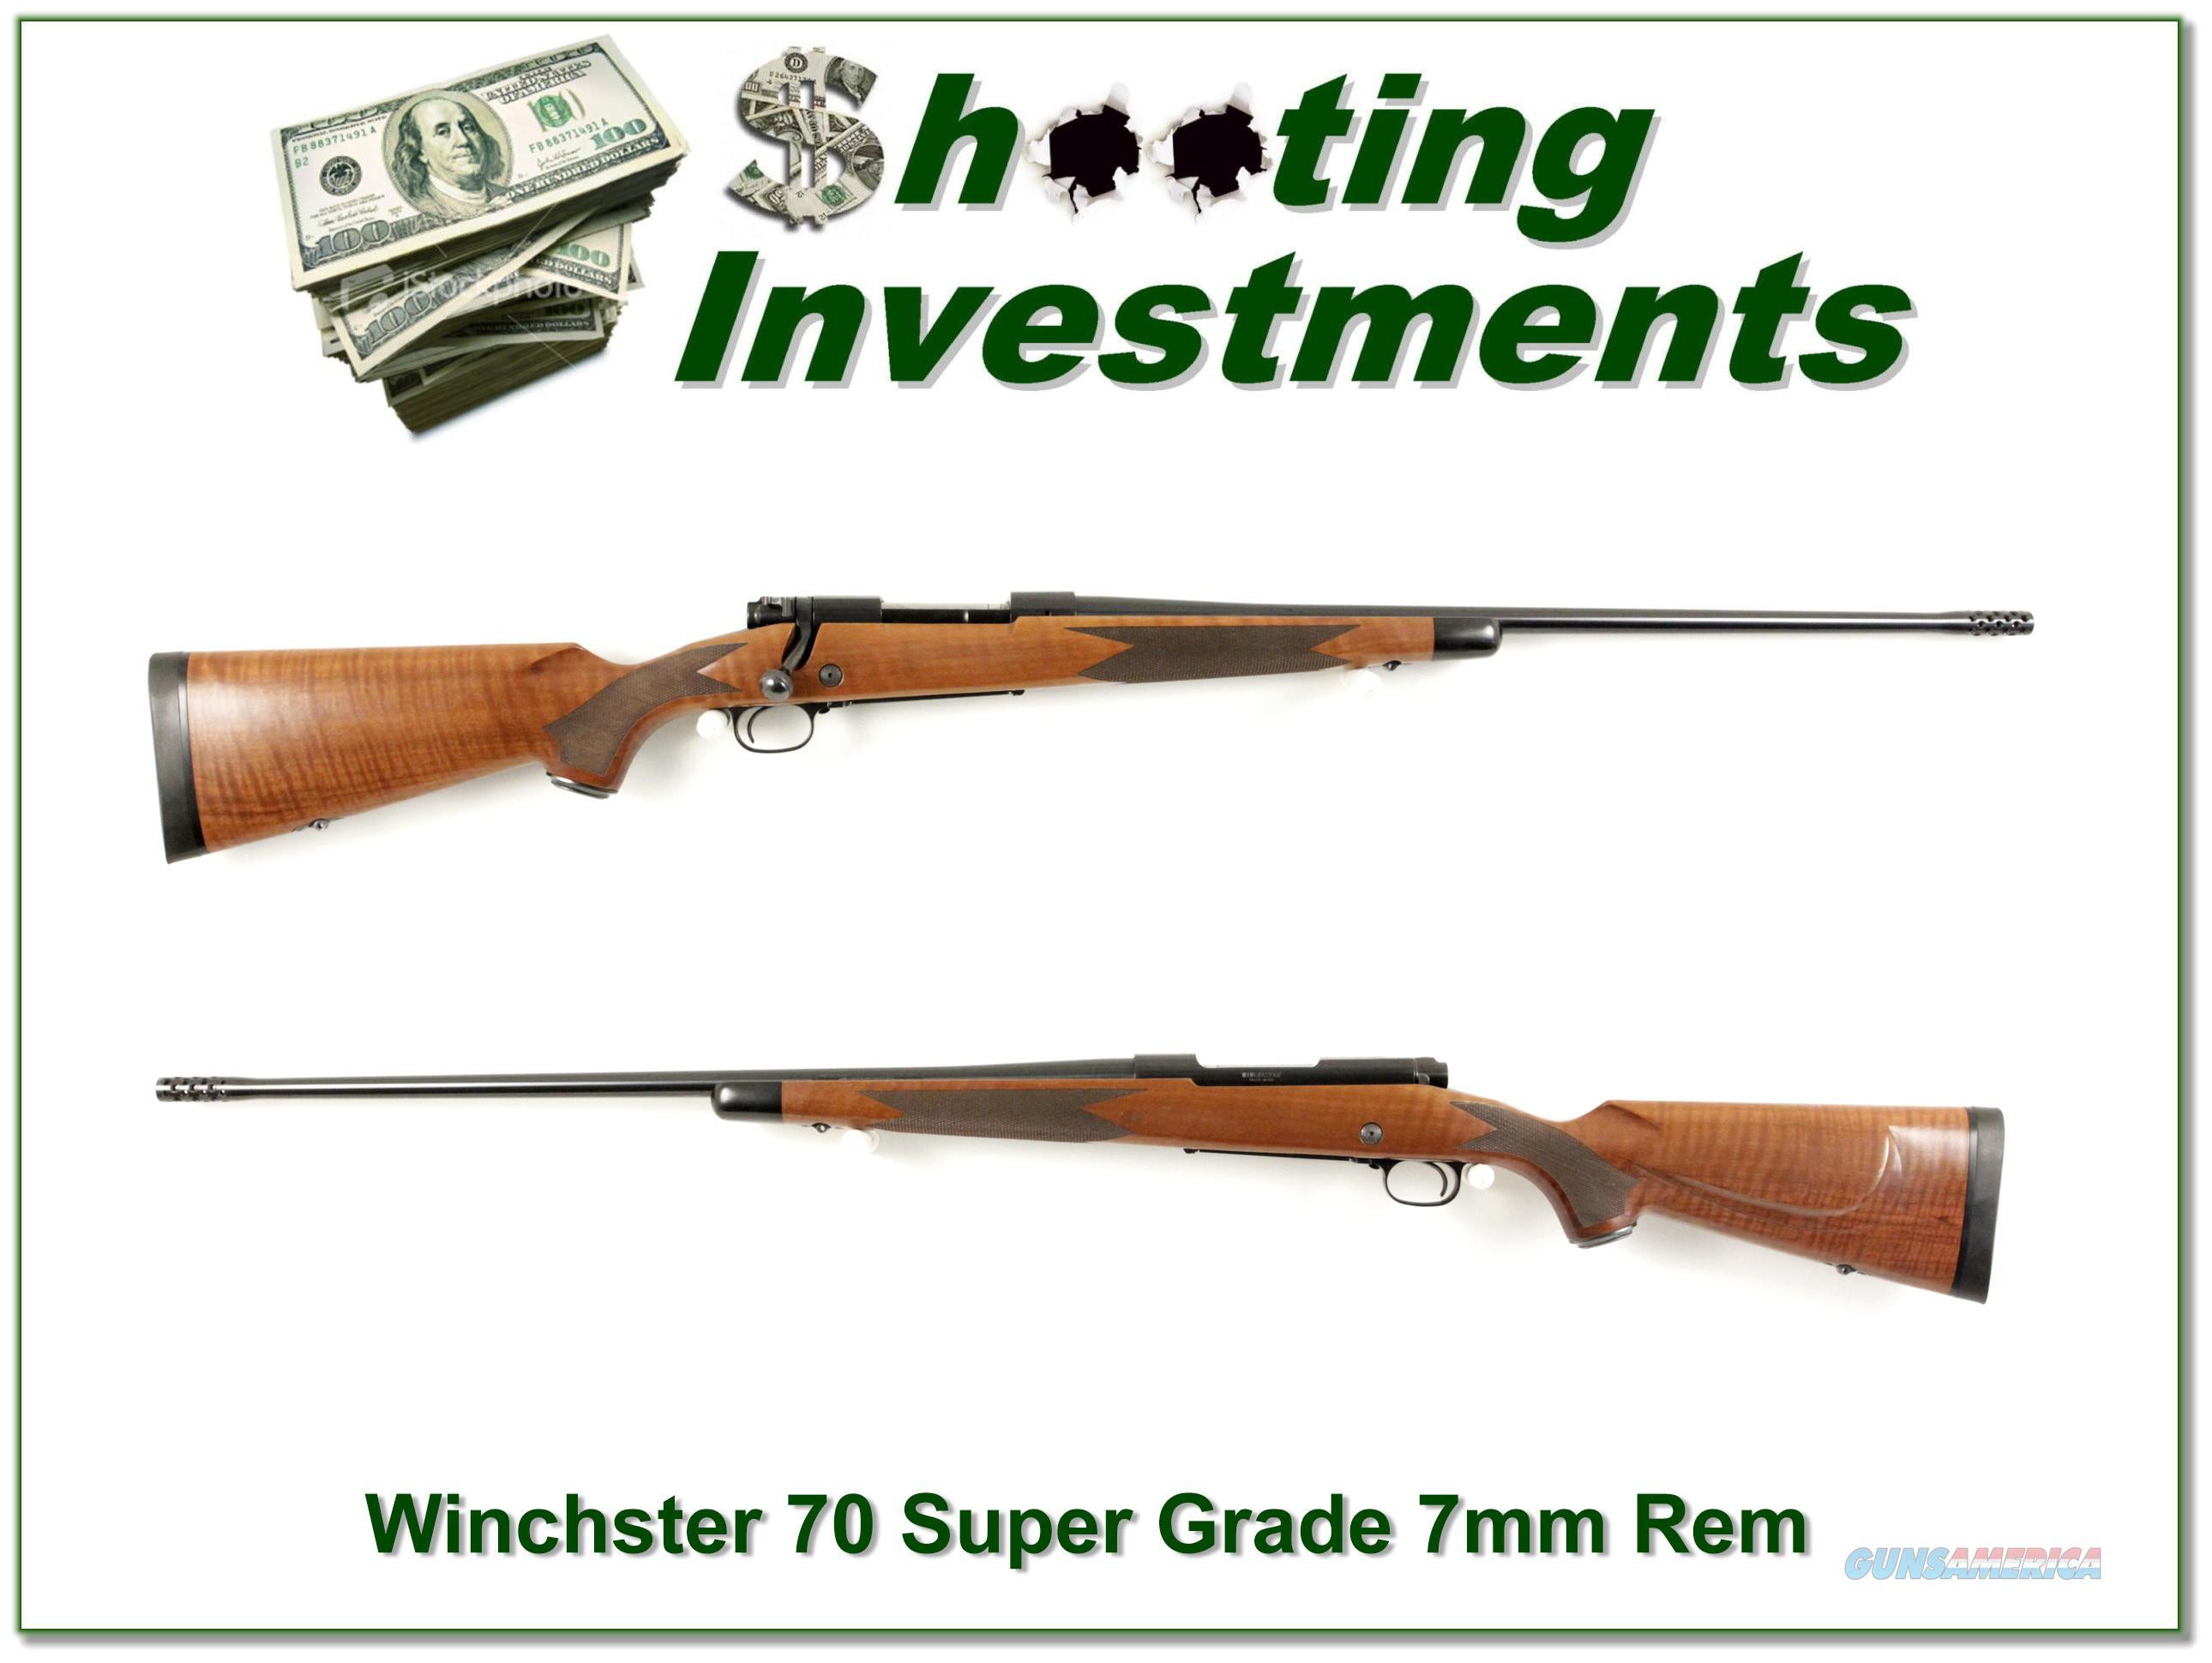 Winchester 70 Classic Super Grade 7mm XX Exc Cond!  Guns > Rifles > Winchester Rifles - Modern Bolt/Auto/Single > Model 70 > Post-64